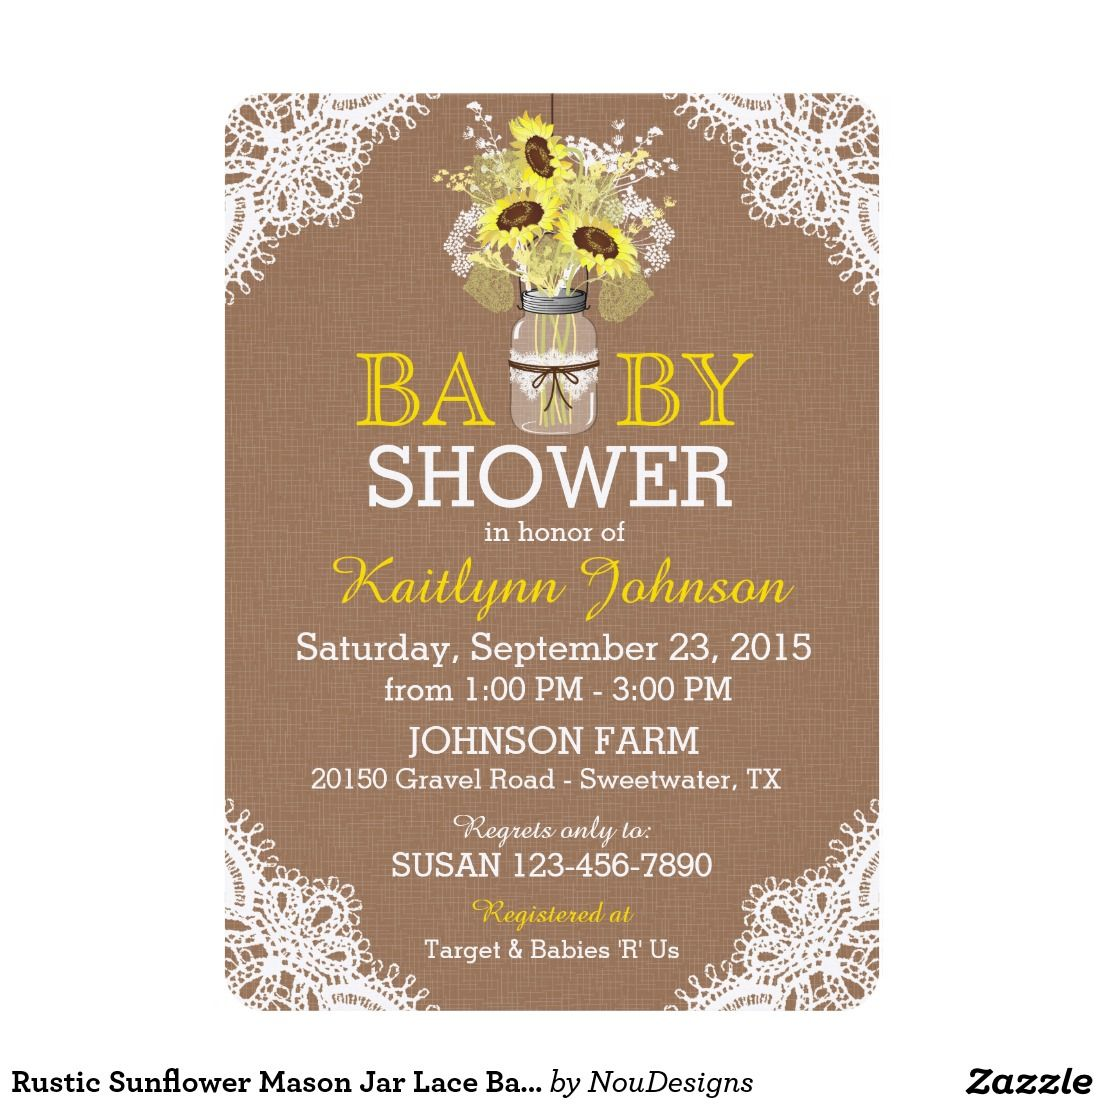 Rustic Sunflower Mason Jar Lace Baby Shower Invite | My Baby Shower ...